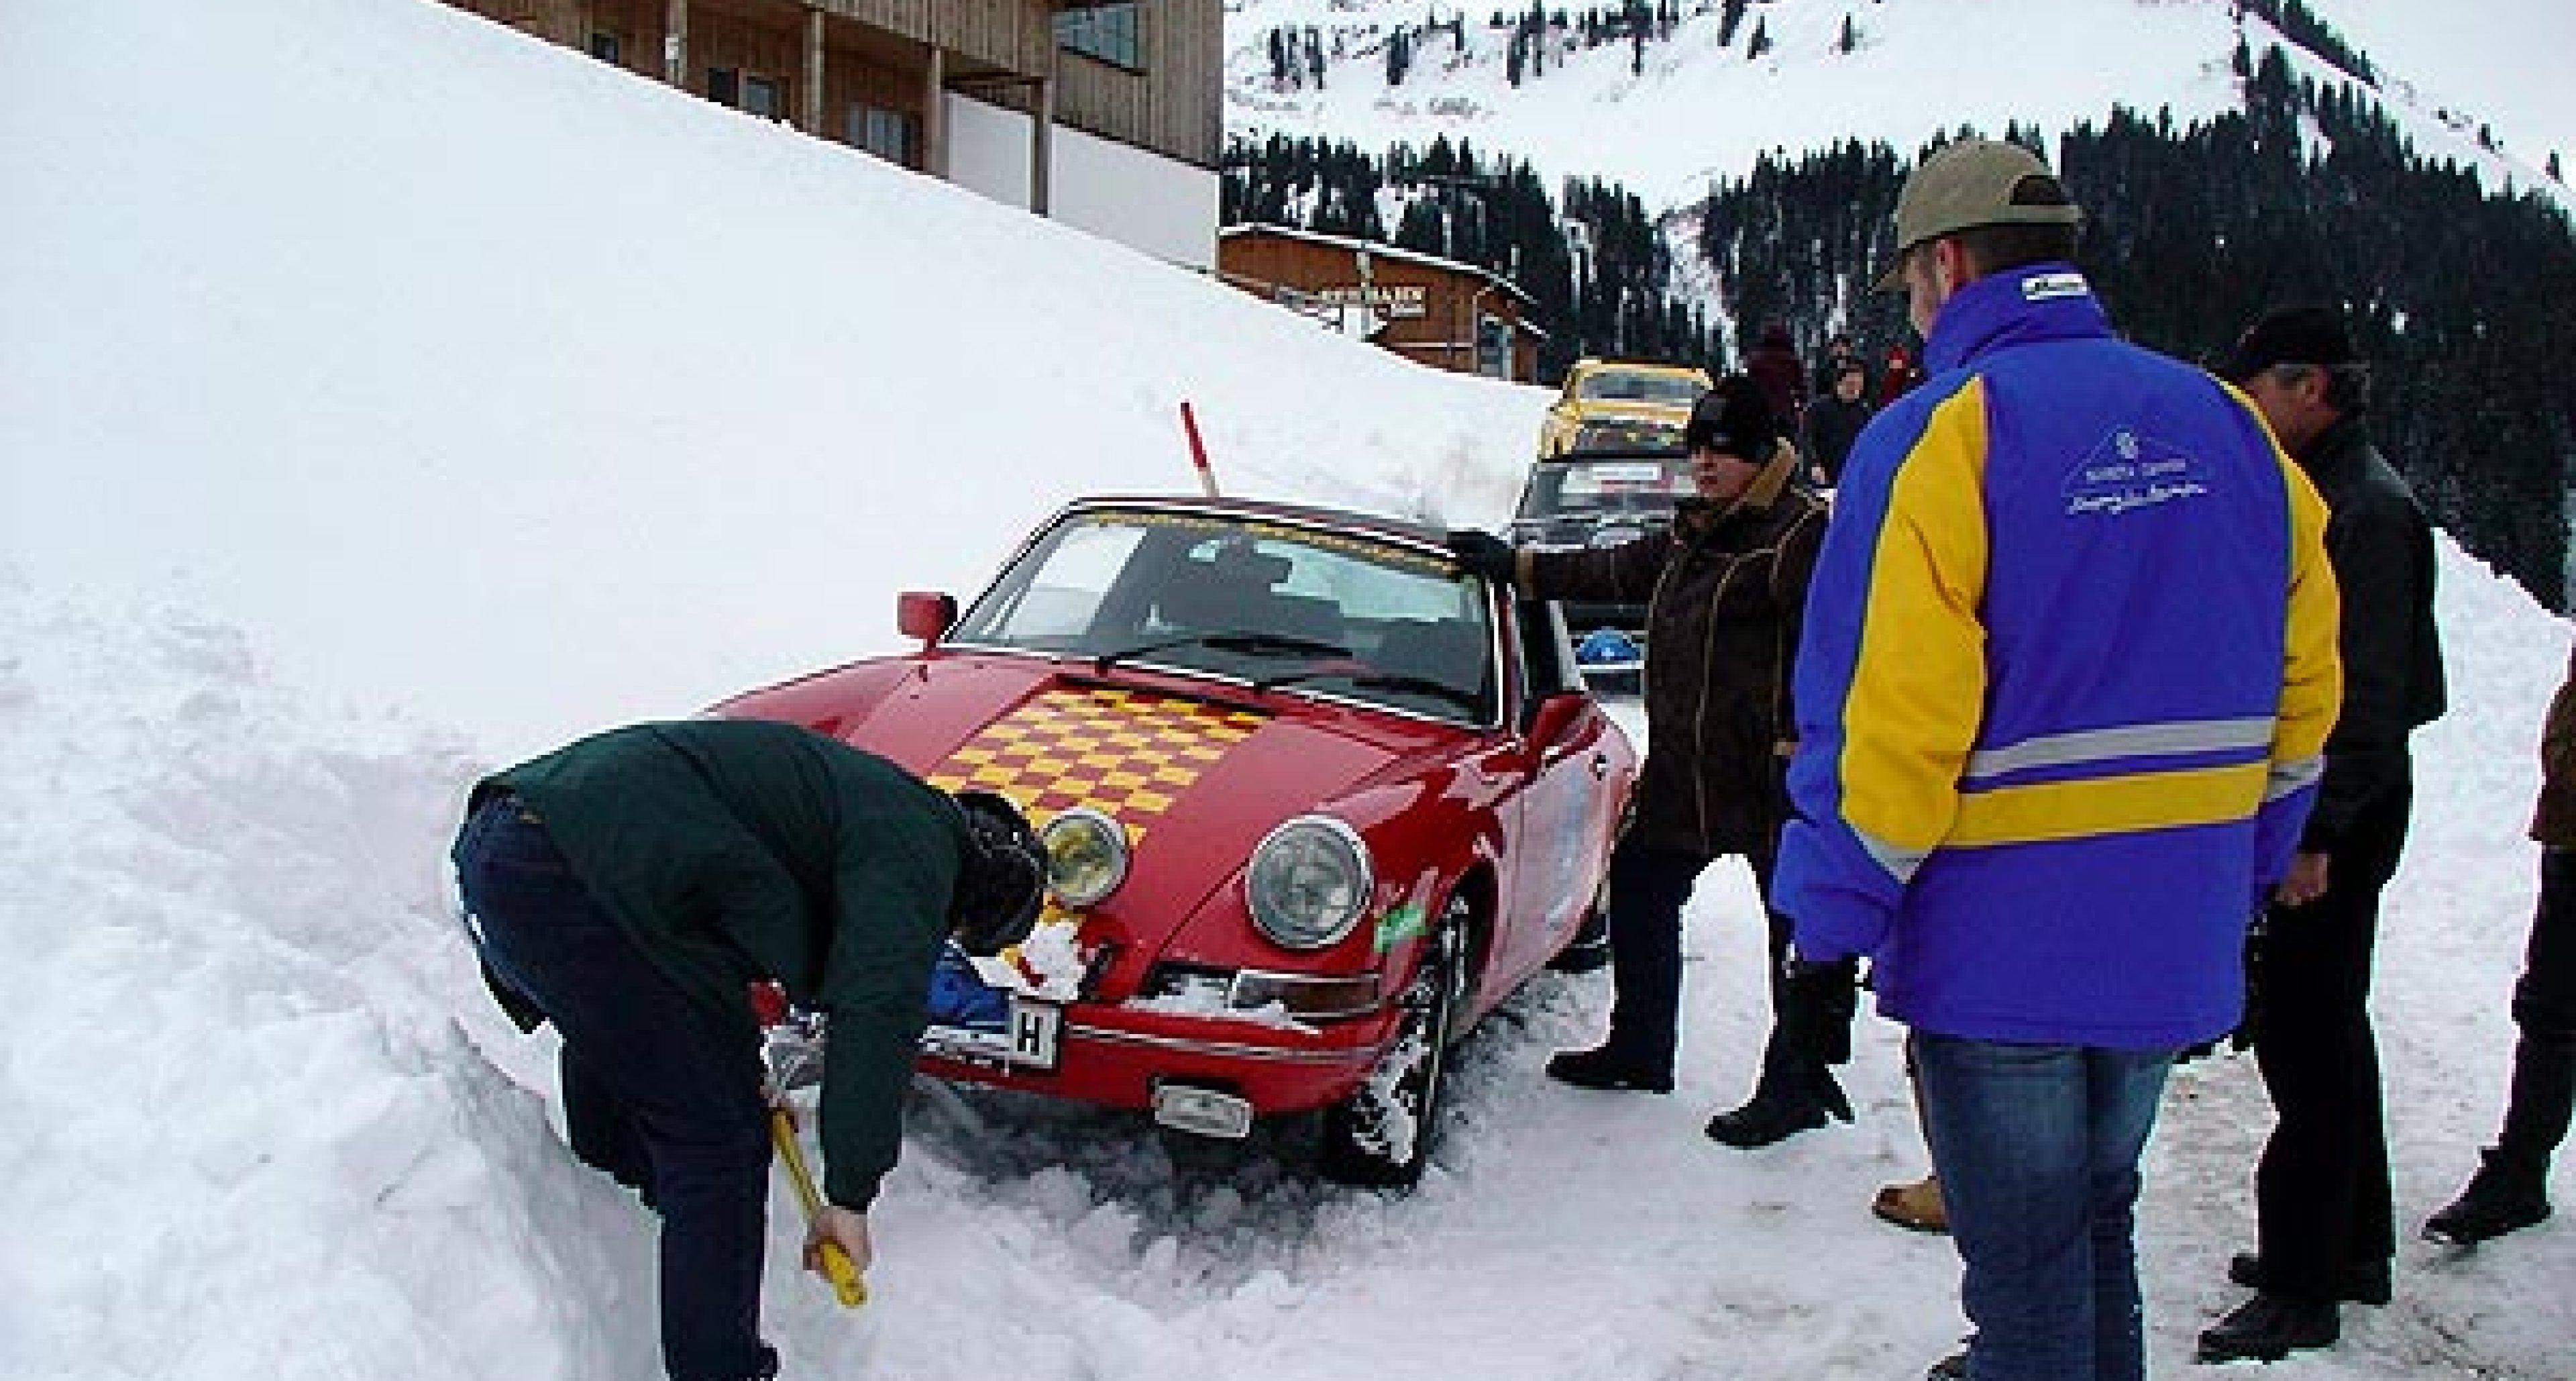 Rückblick: 3. Ländle Classic Schneegestöber 2004